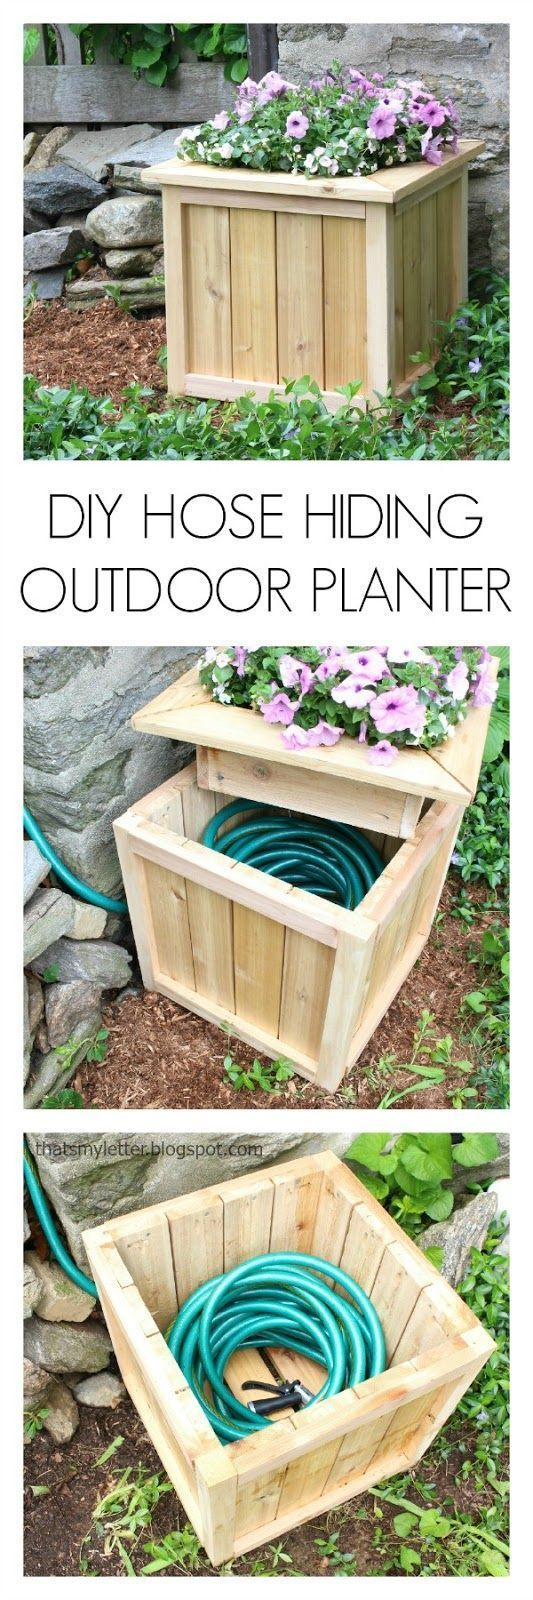 DIY Planter Box with Hidden Hose Storage.